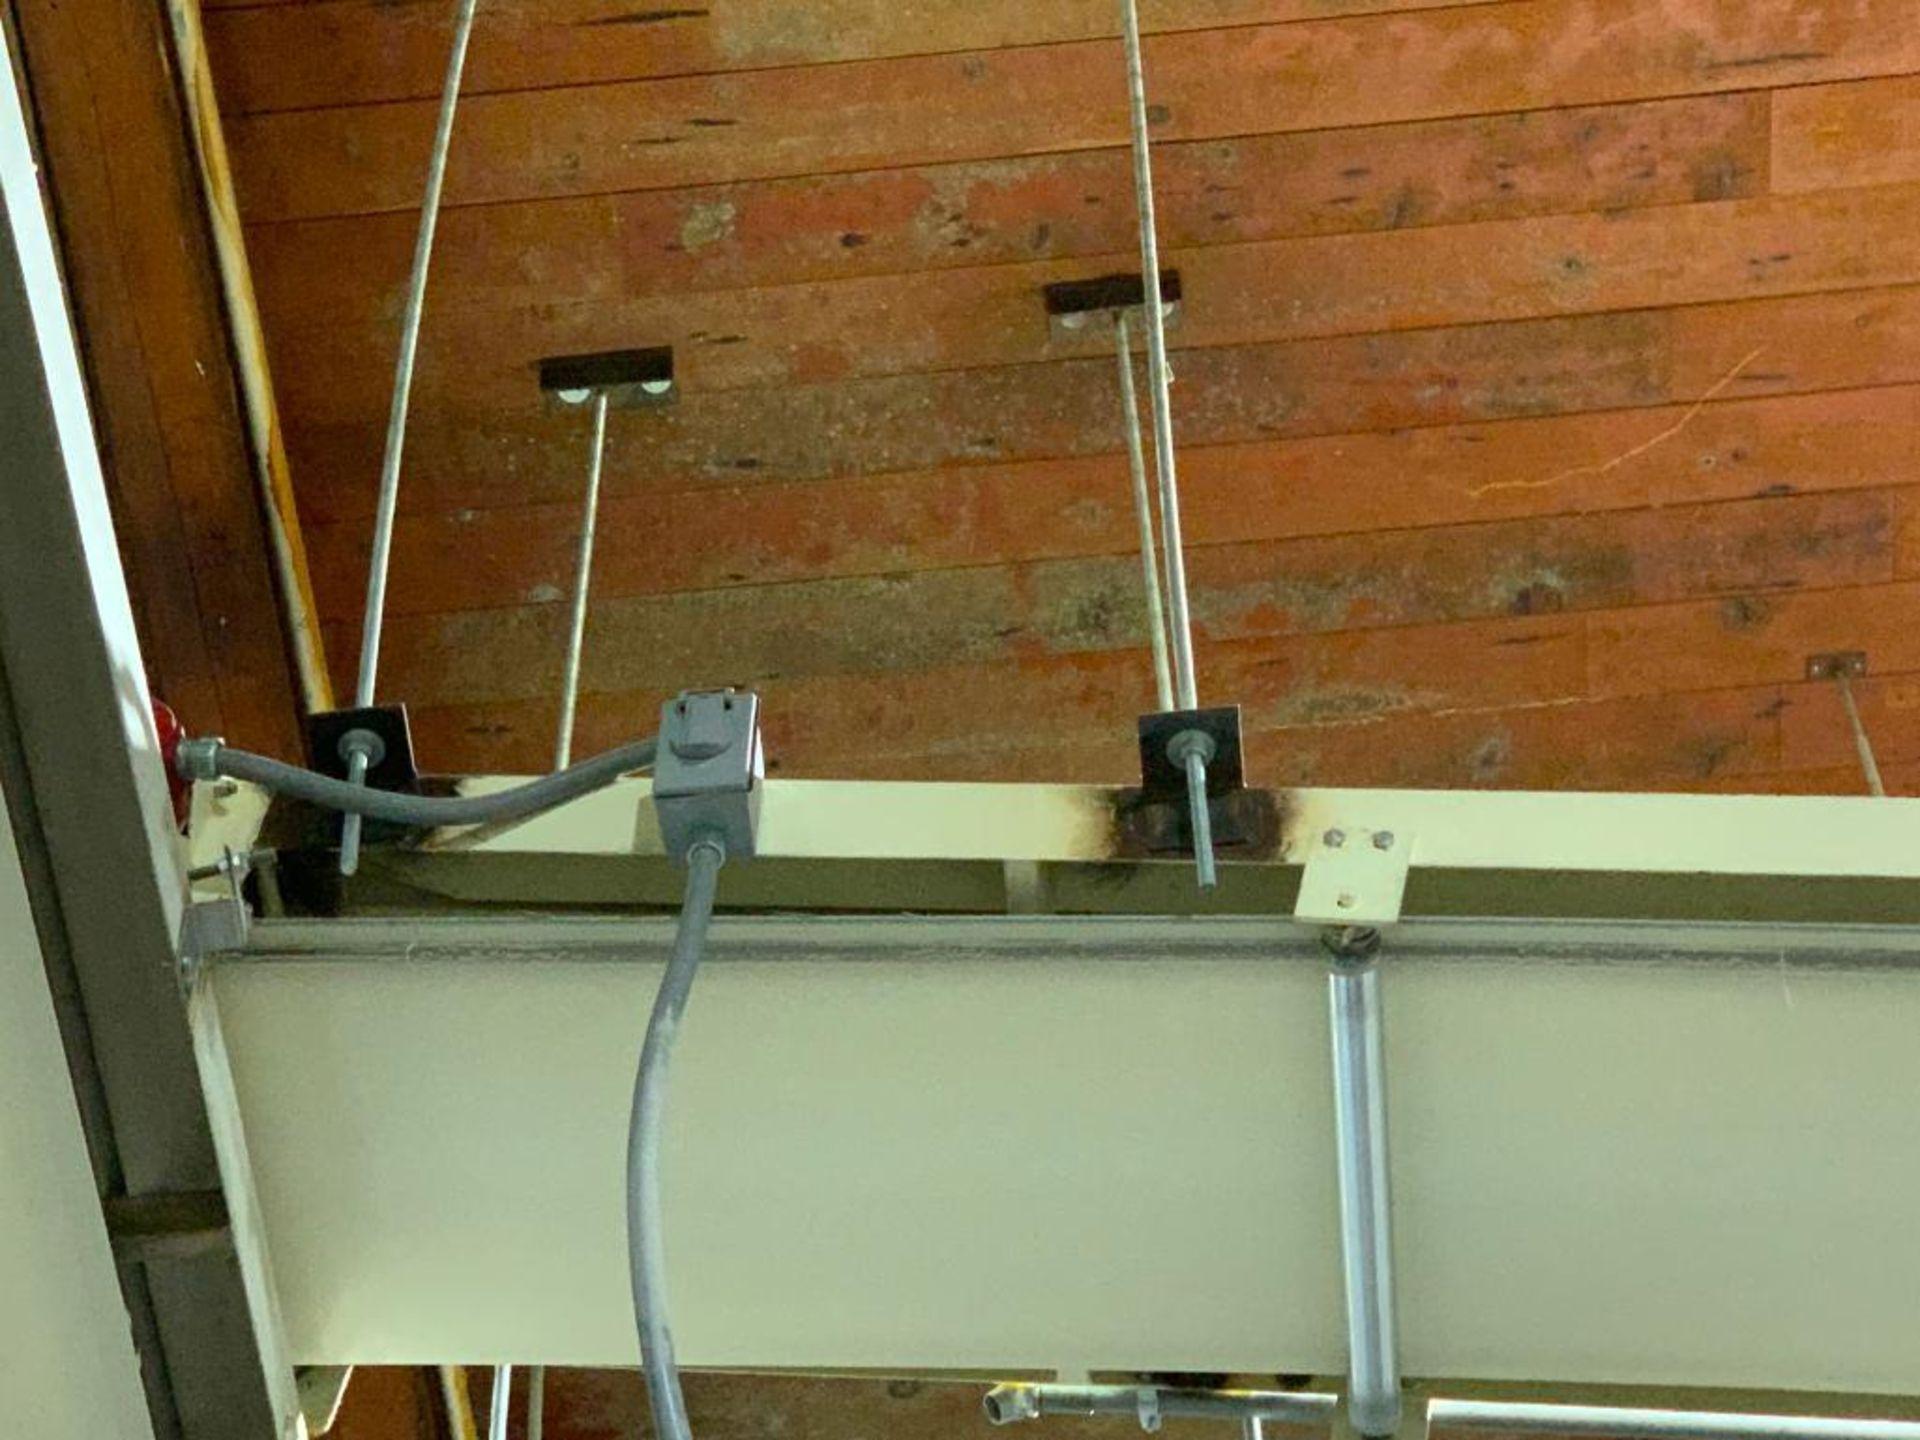 Aseeco mild steel decline conveyor - Image 9 of 12